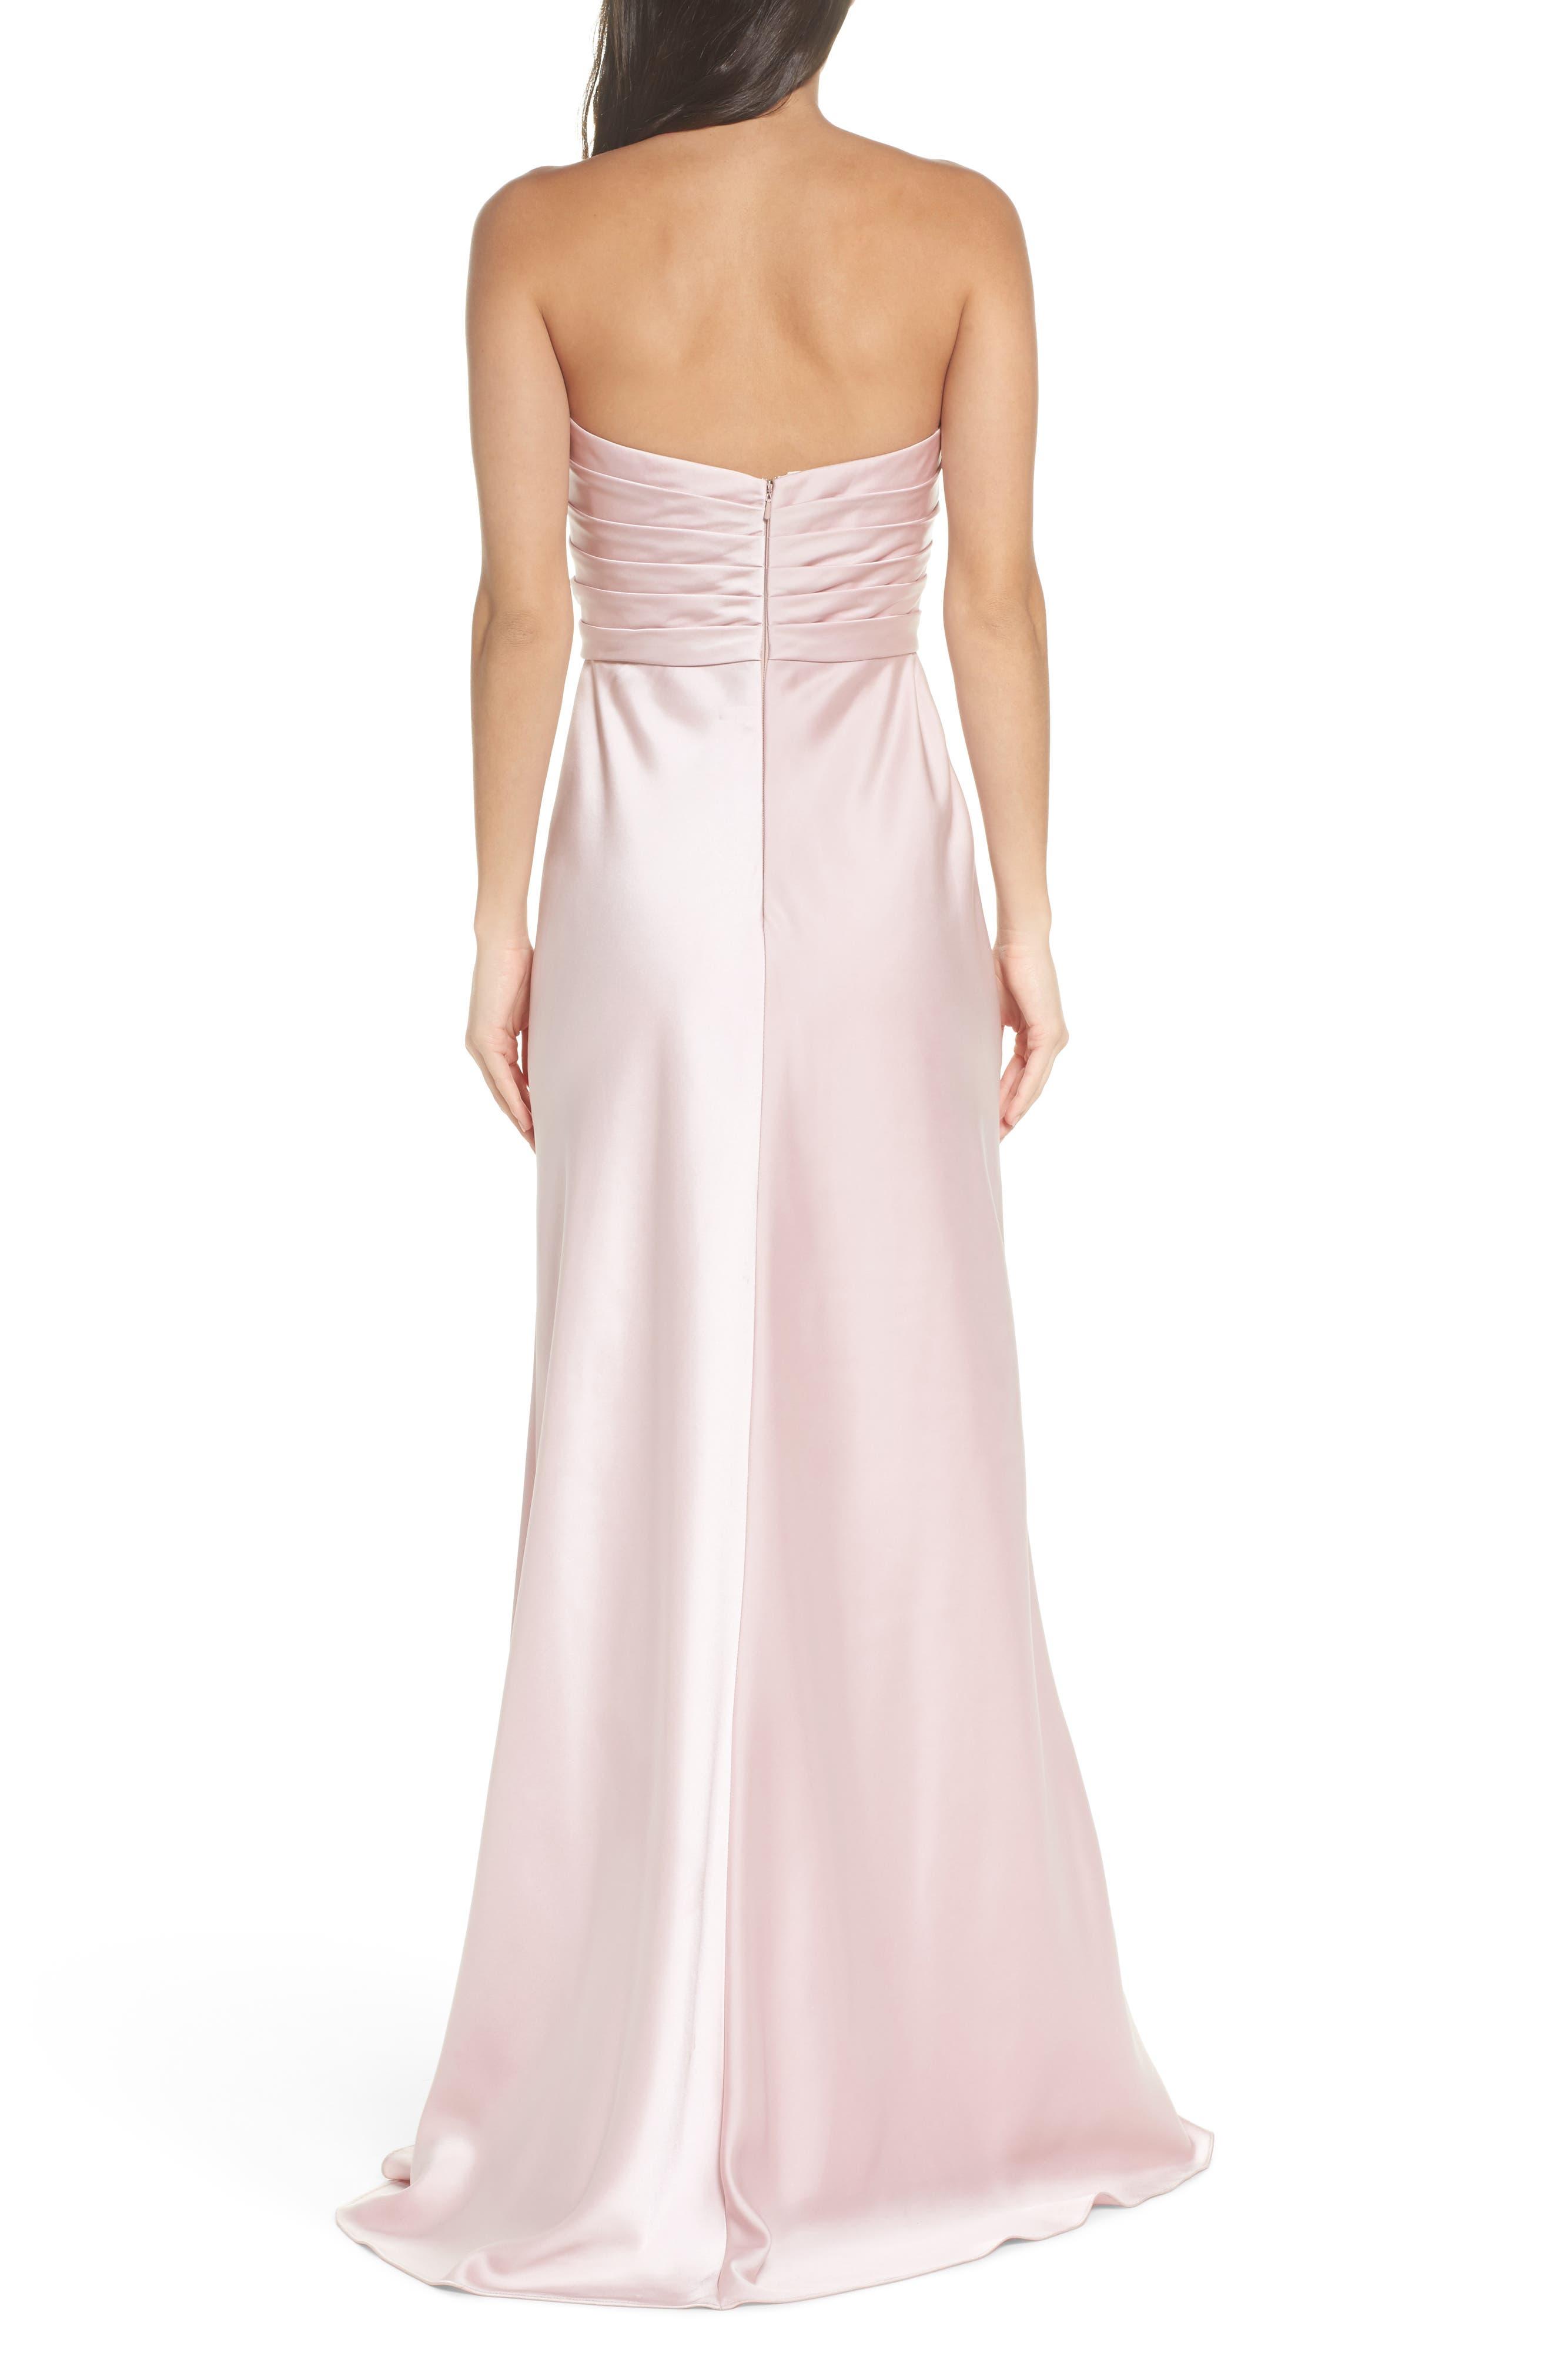 Gathered Strapless Satin Gown,                             Alternate thumbnail 2, color,                             Blush